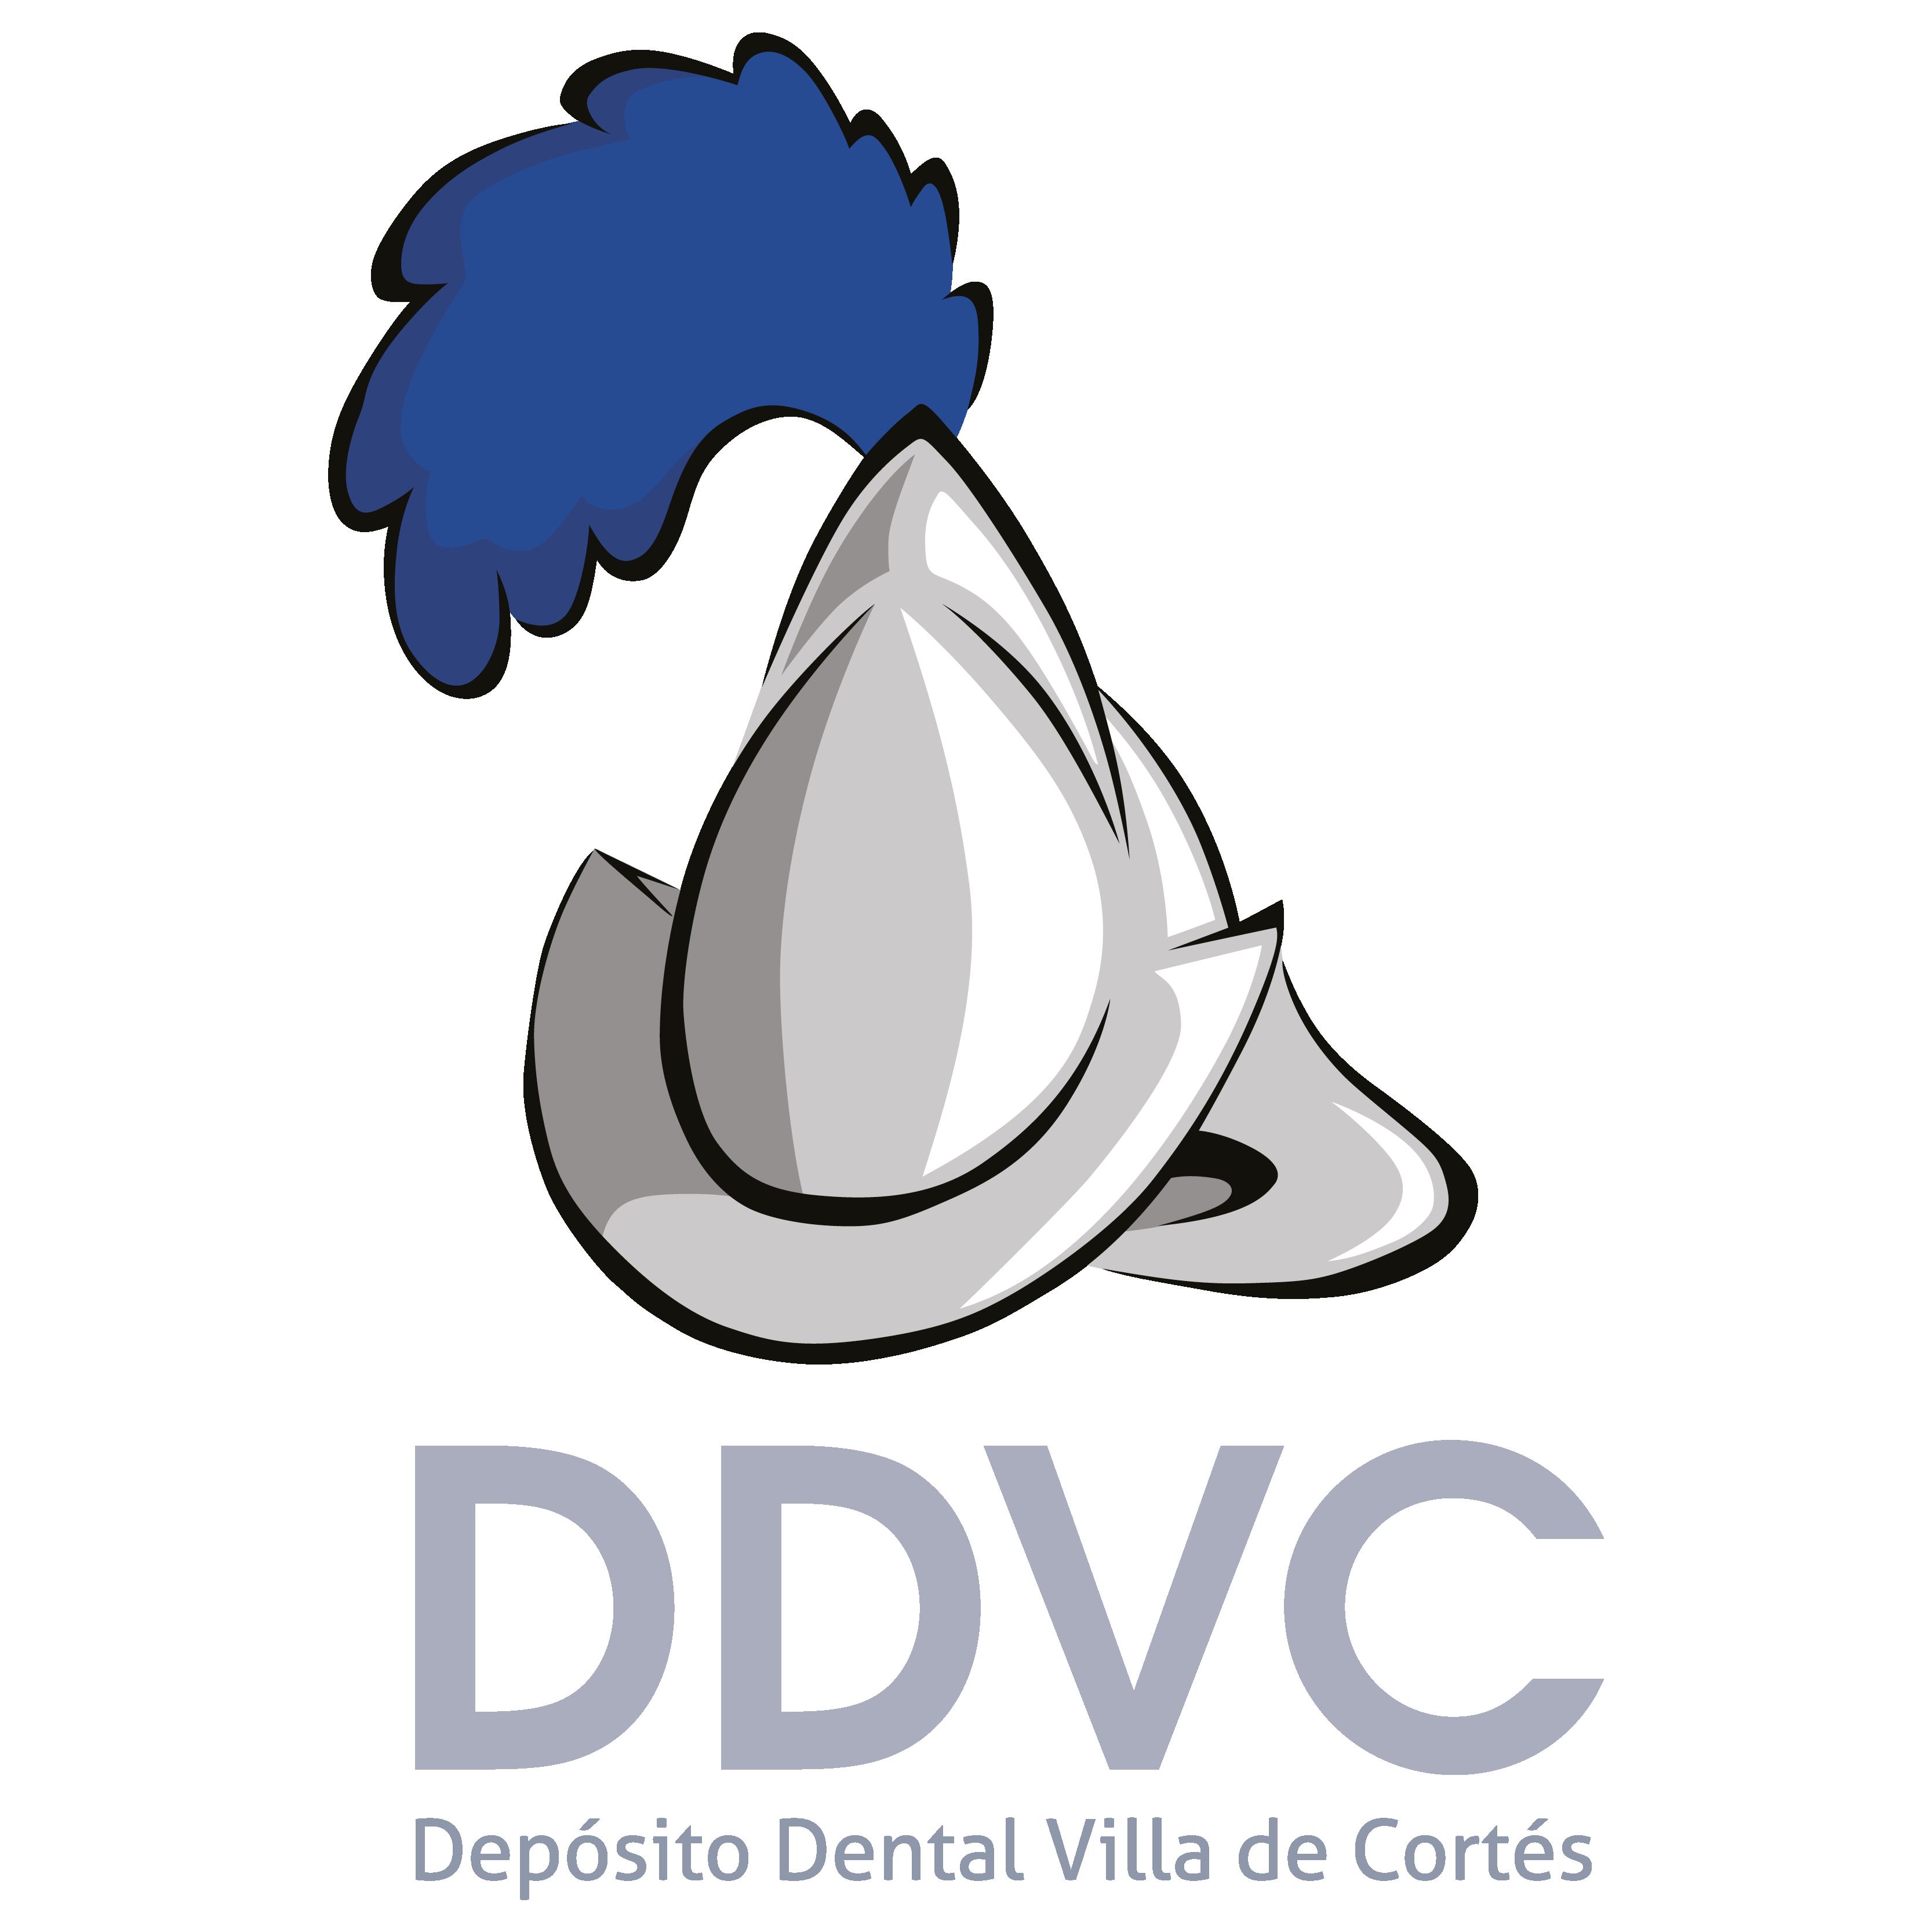 logo-ddvc-01